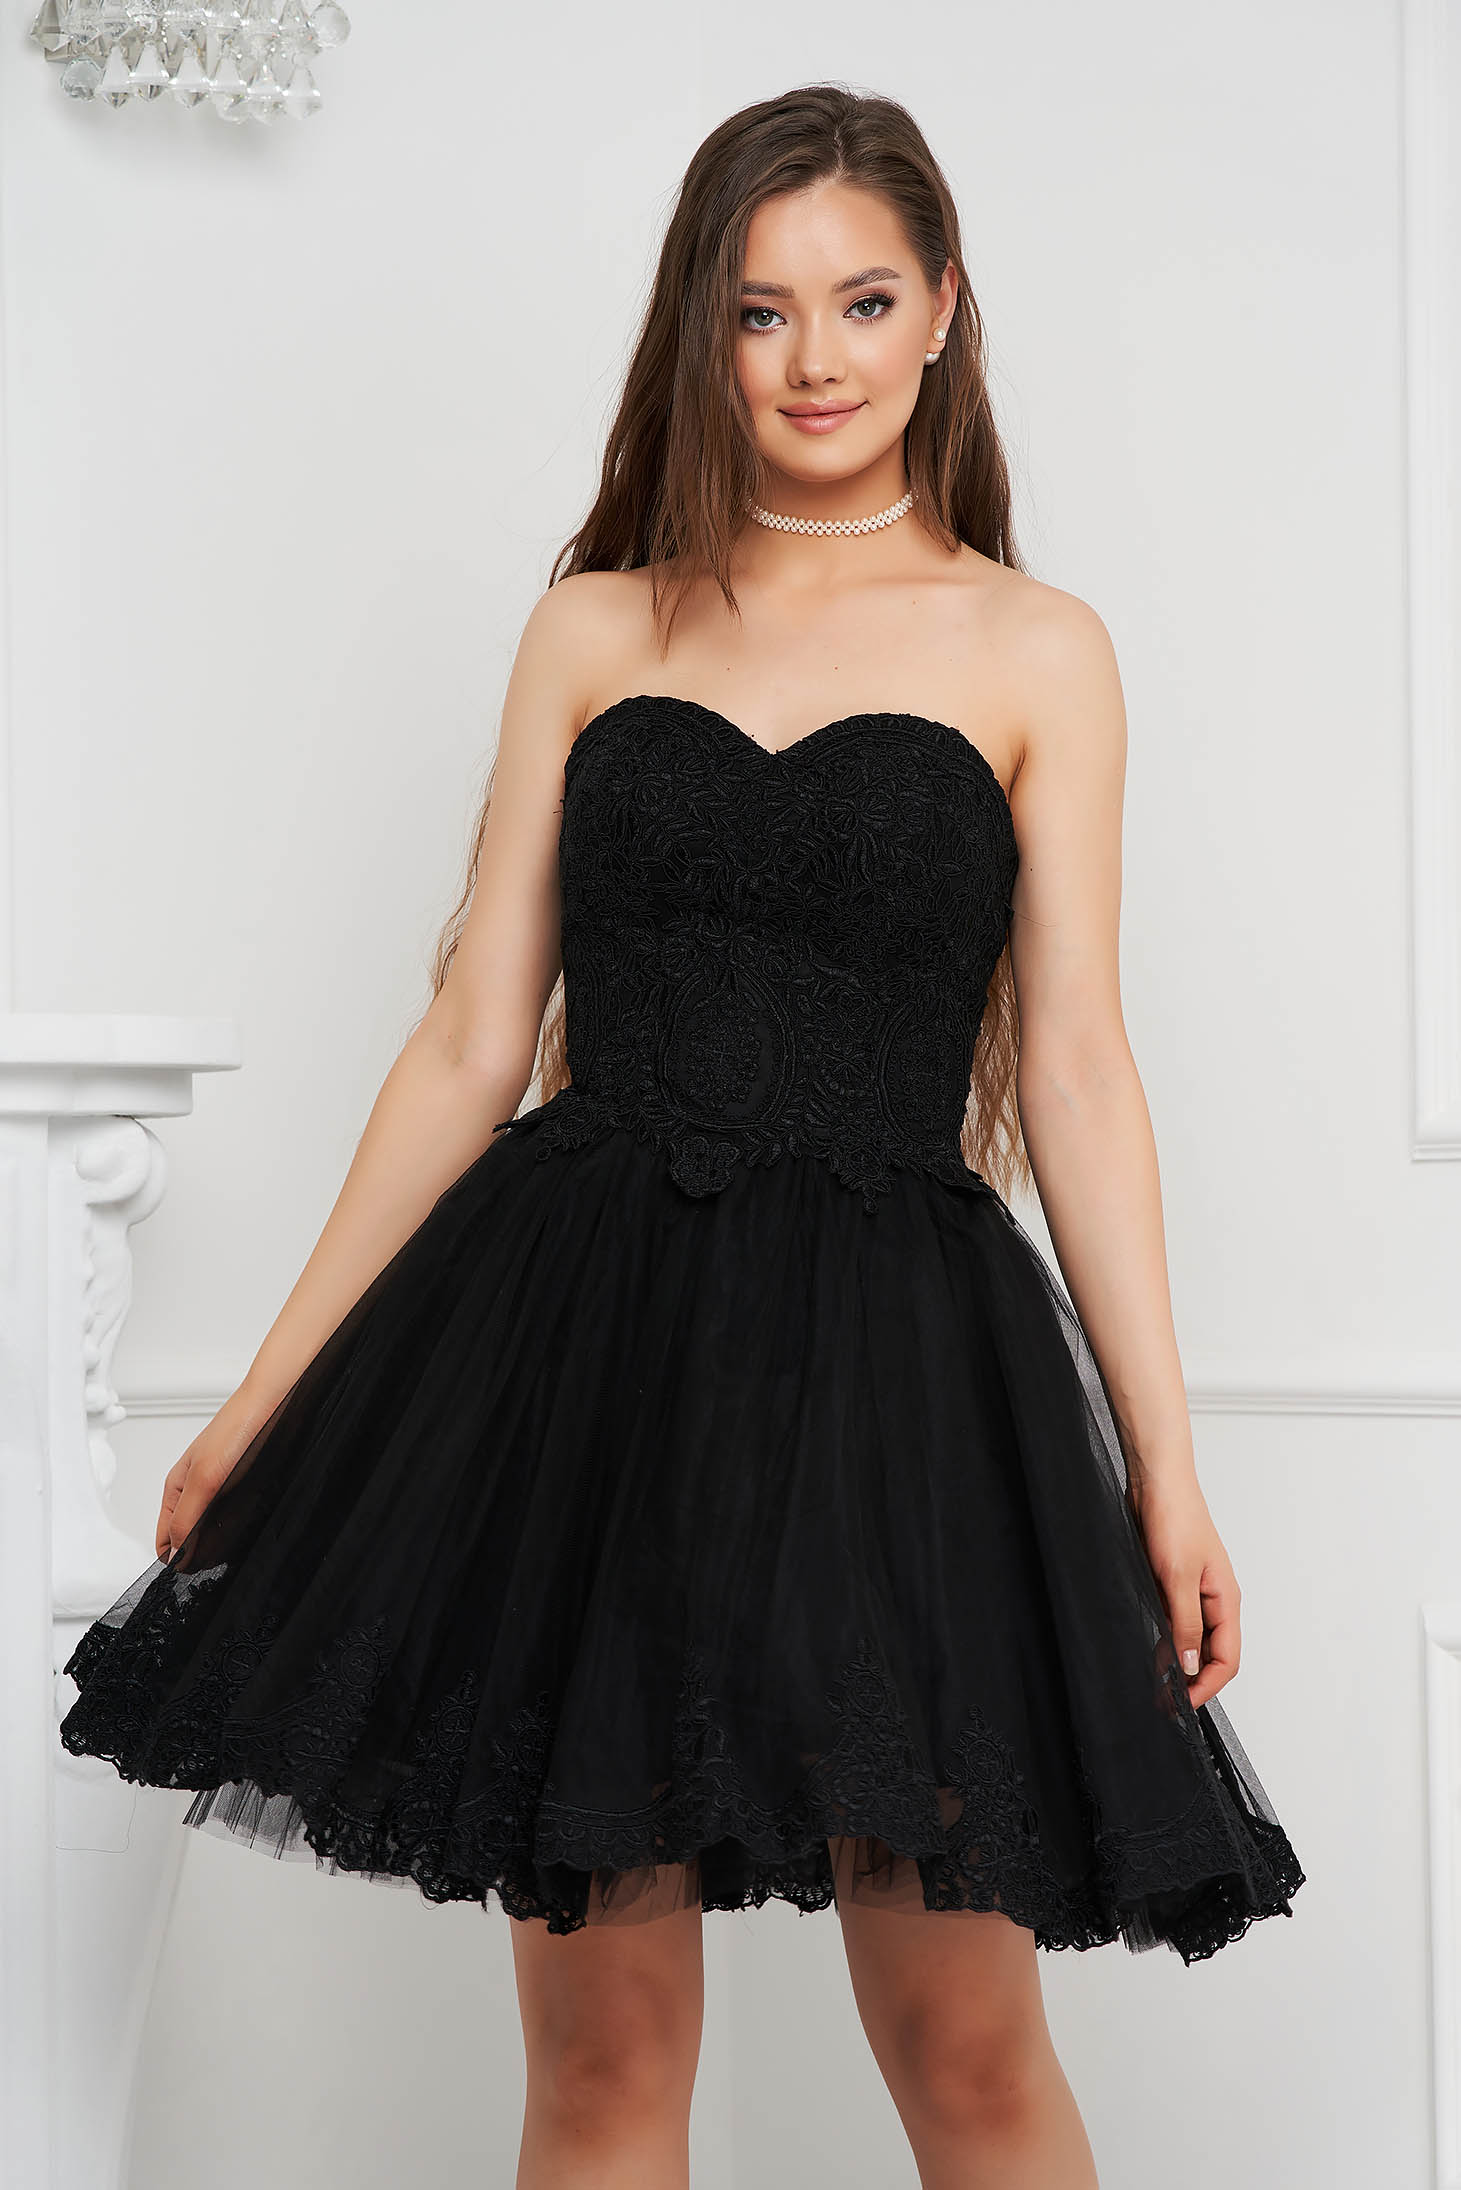 Rochie neagra scurta de ocazie in clos din voal cu bust buretat tip corset si broderie